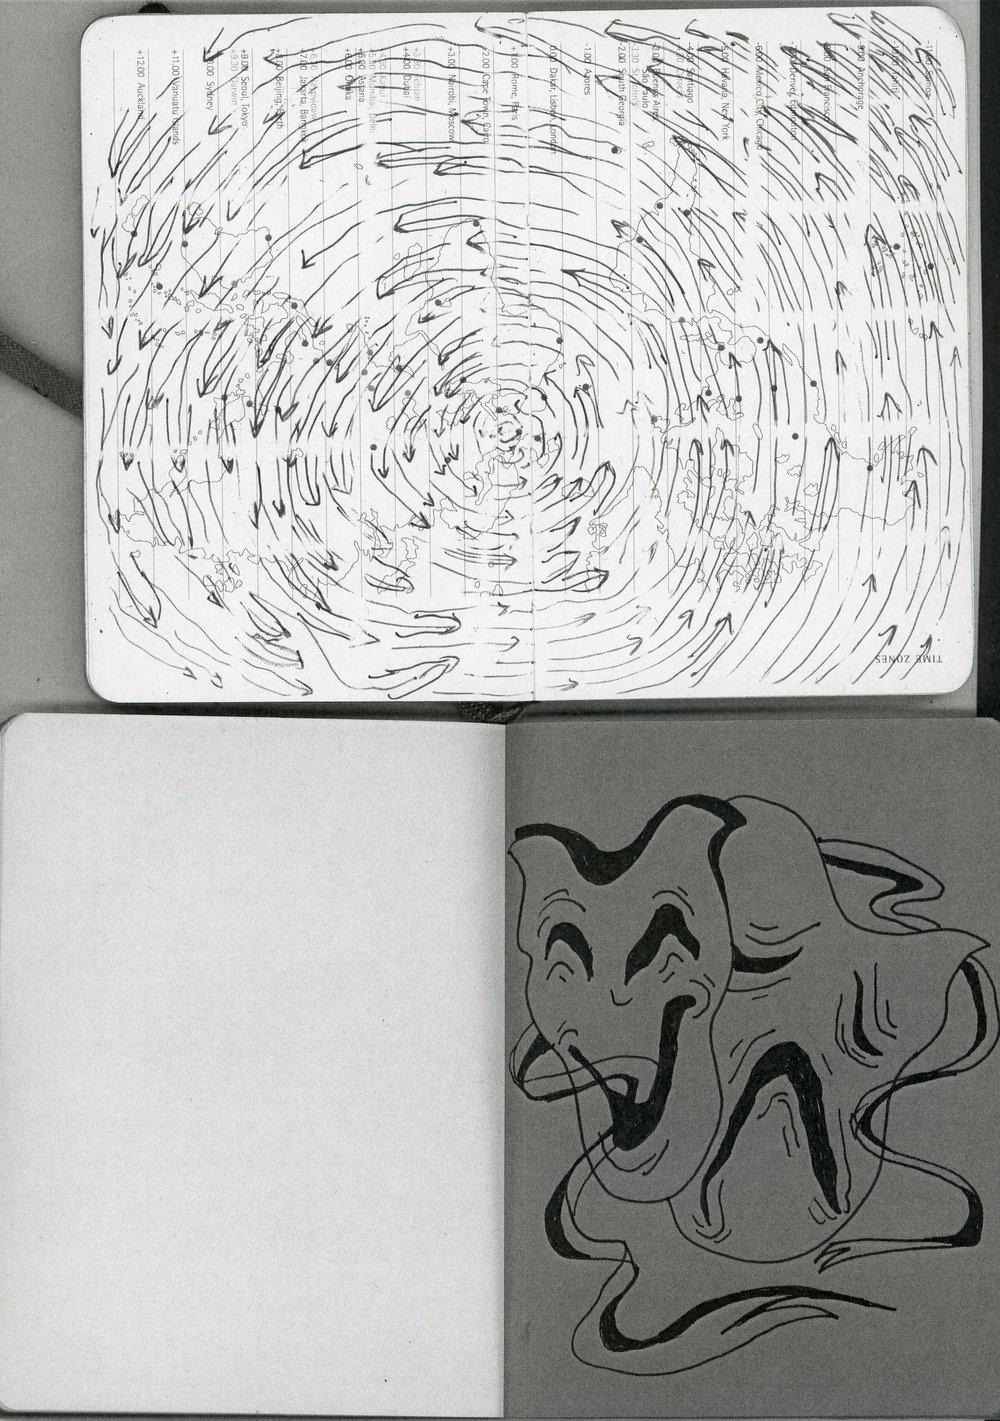 21.0 x 29.7cm black and white print  2018 Agenda & Coloured Booklet